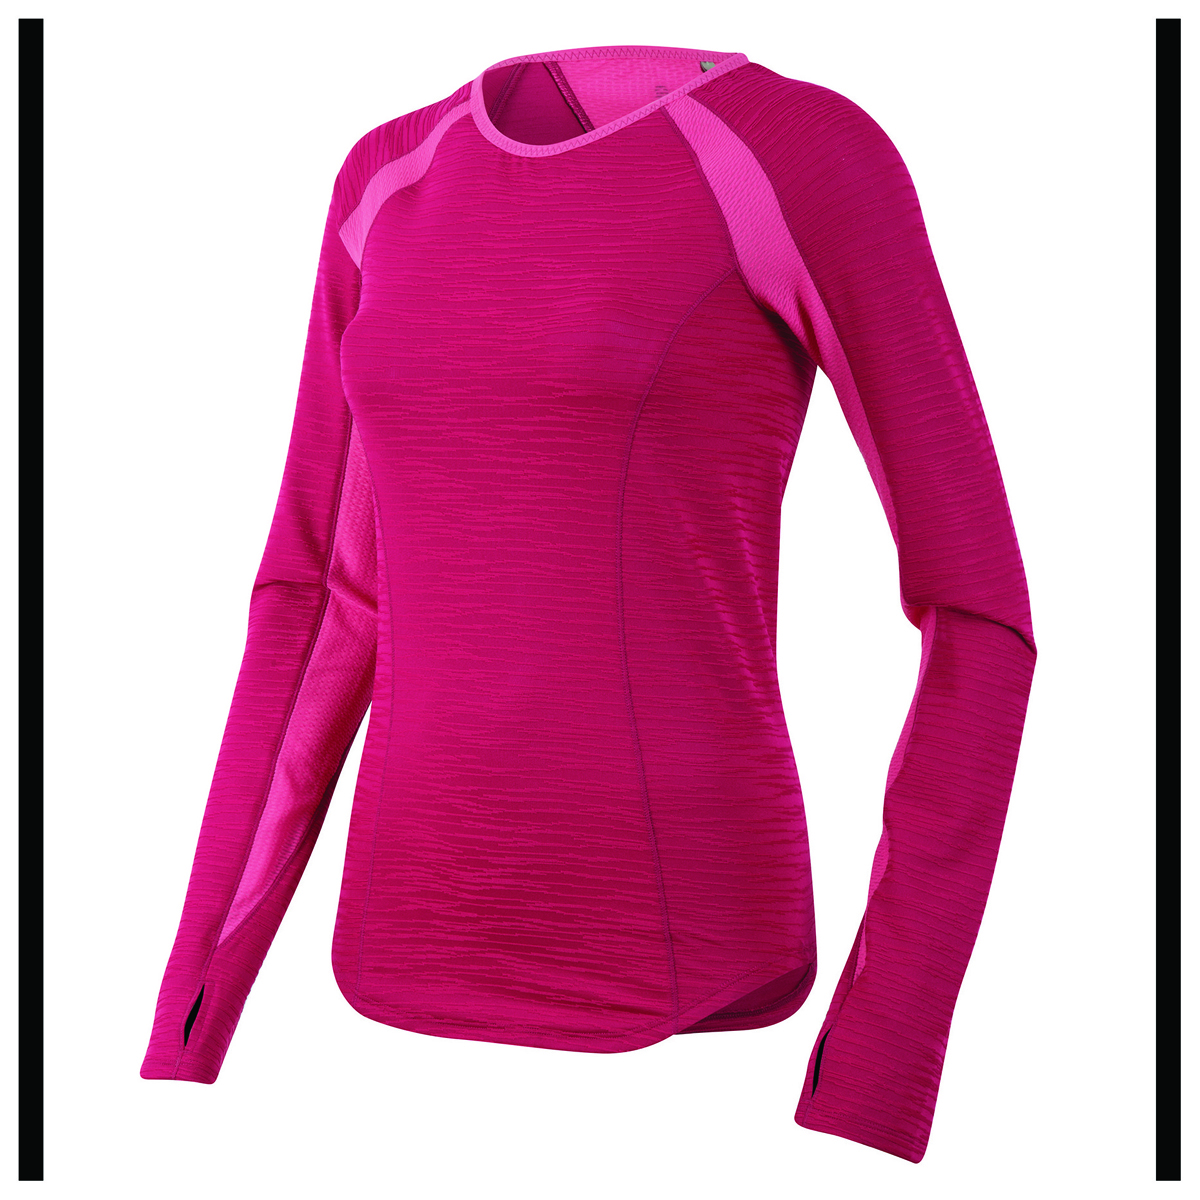 Pearl Izumi - Koszulka Bieg Dam D/R Flash Kolor czerwono-różowy M